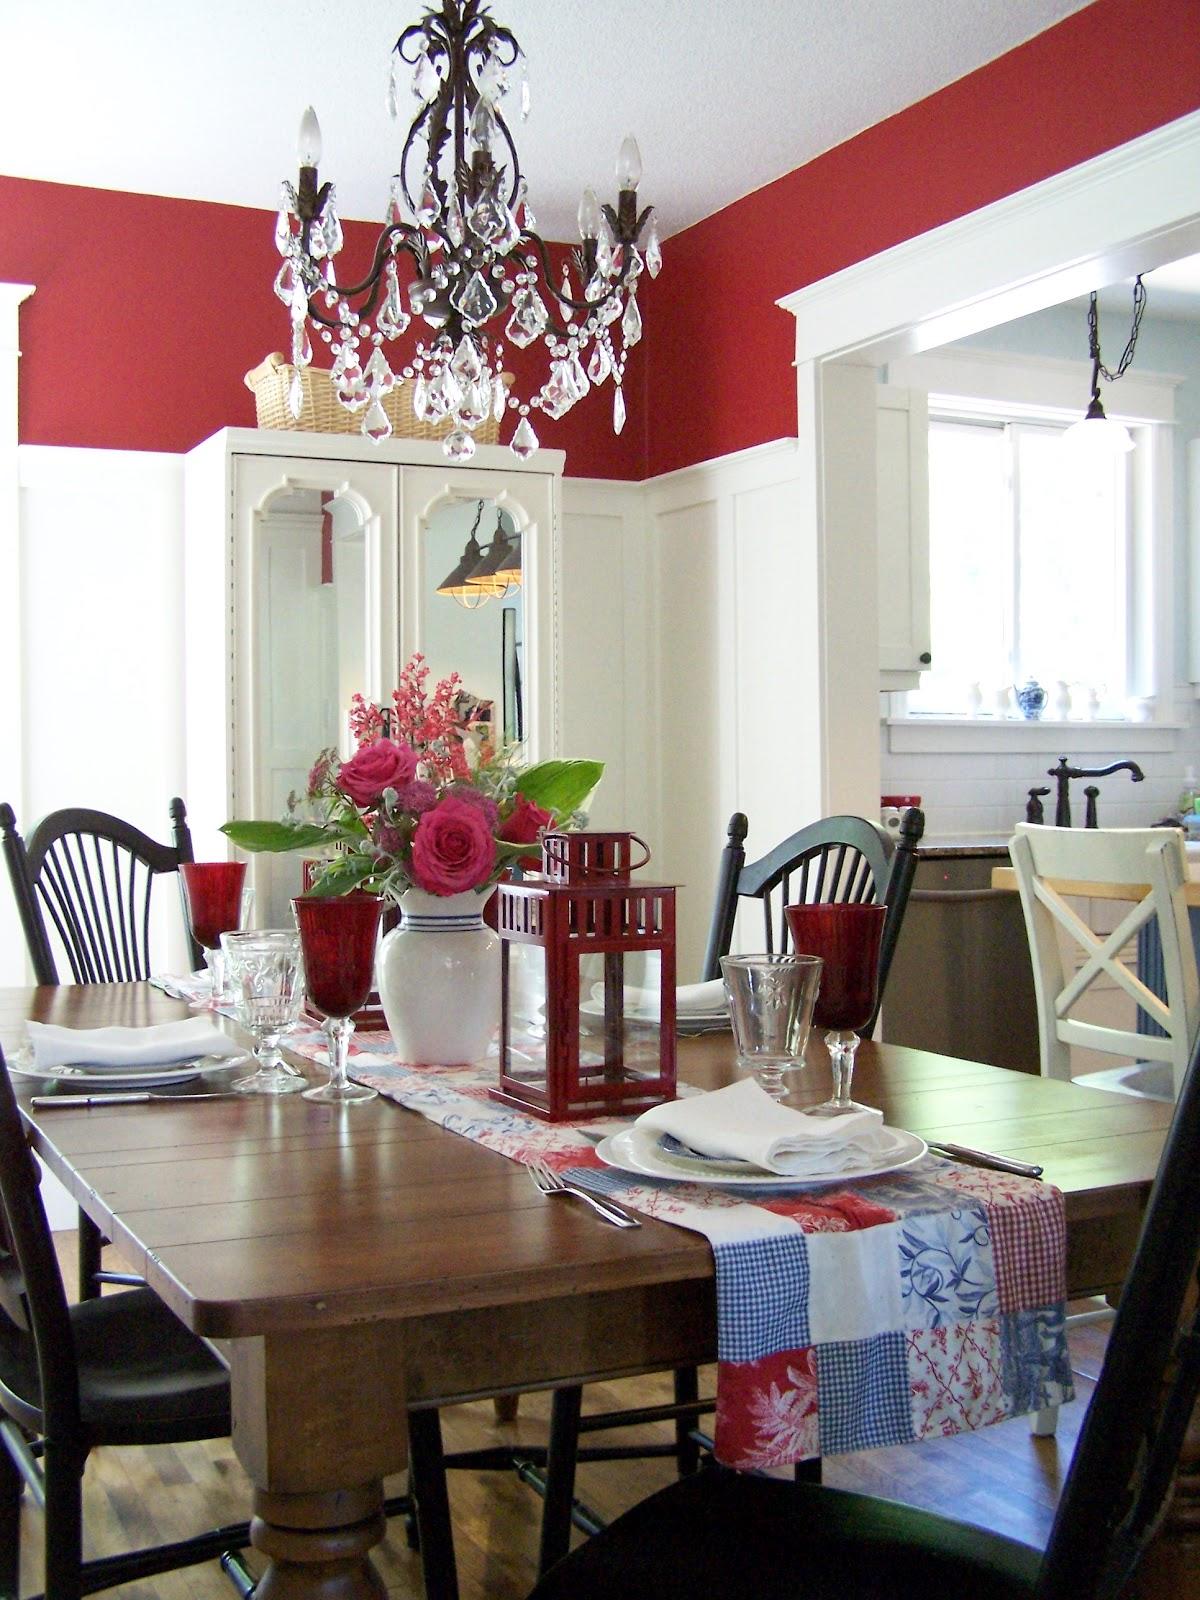 delorme designs navy mint aqua and red. Black Bedroom Furniture Sets. Home Design Ideas